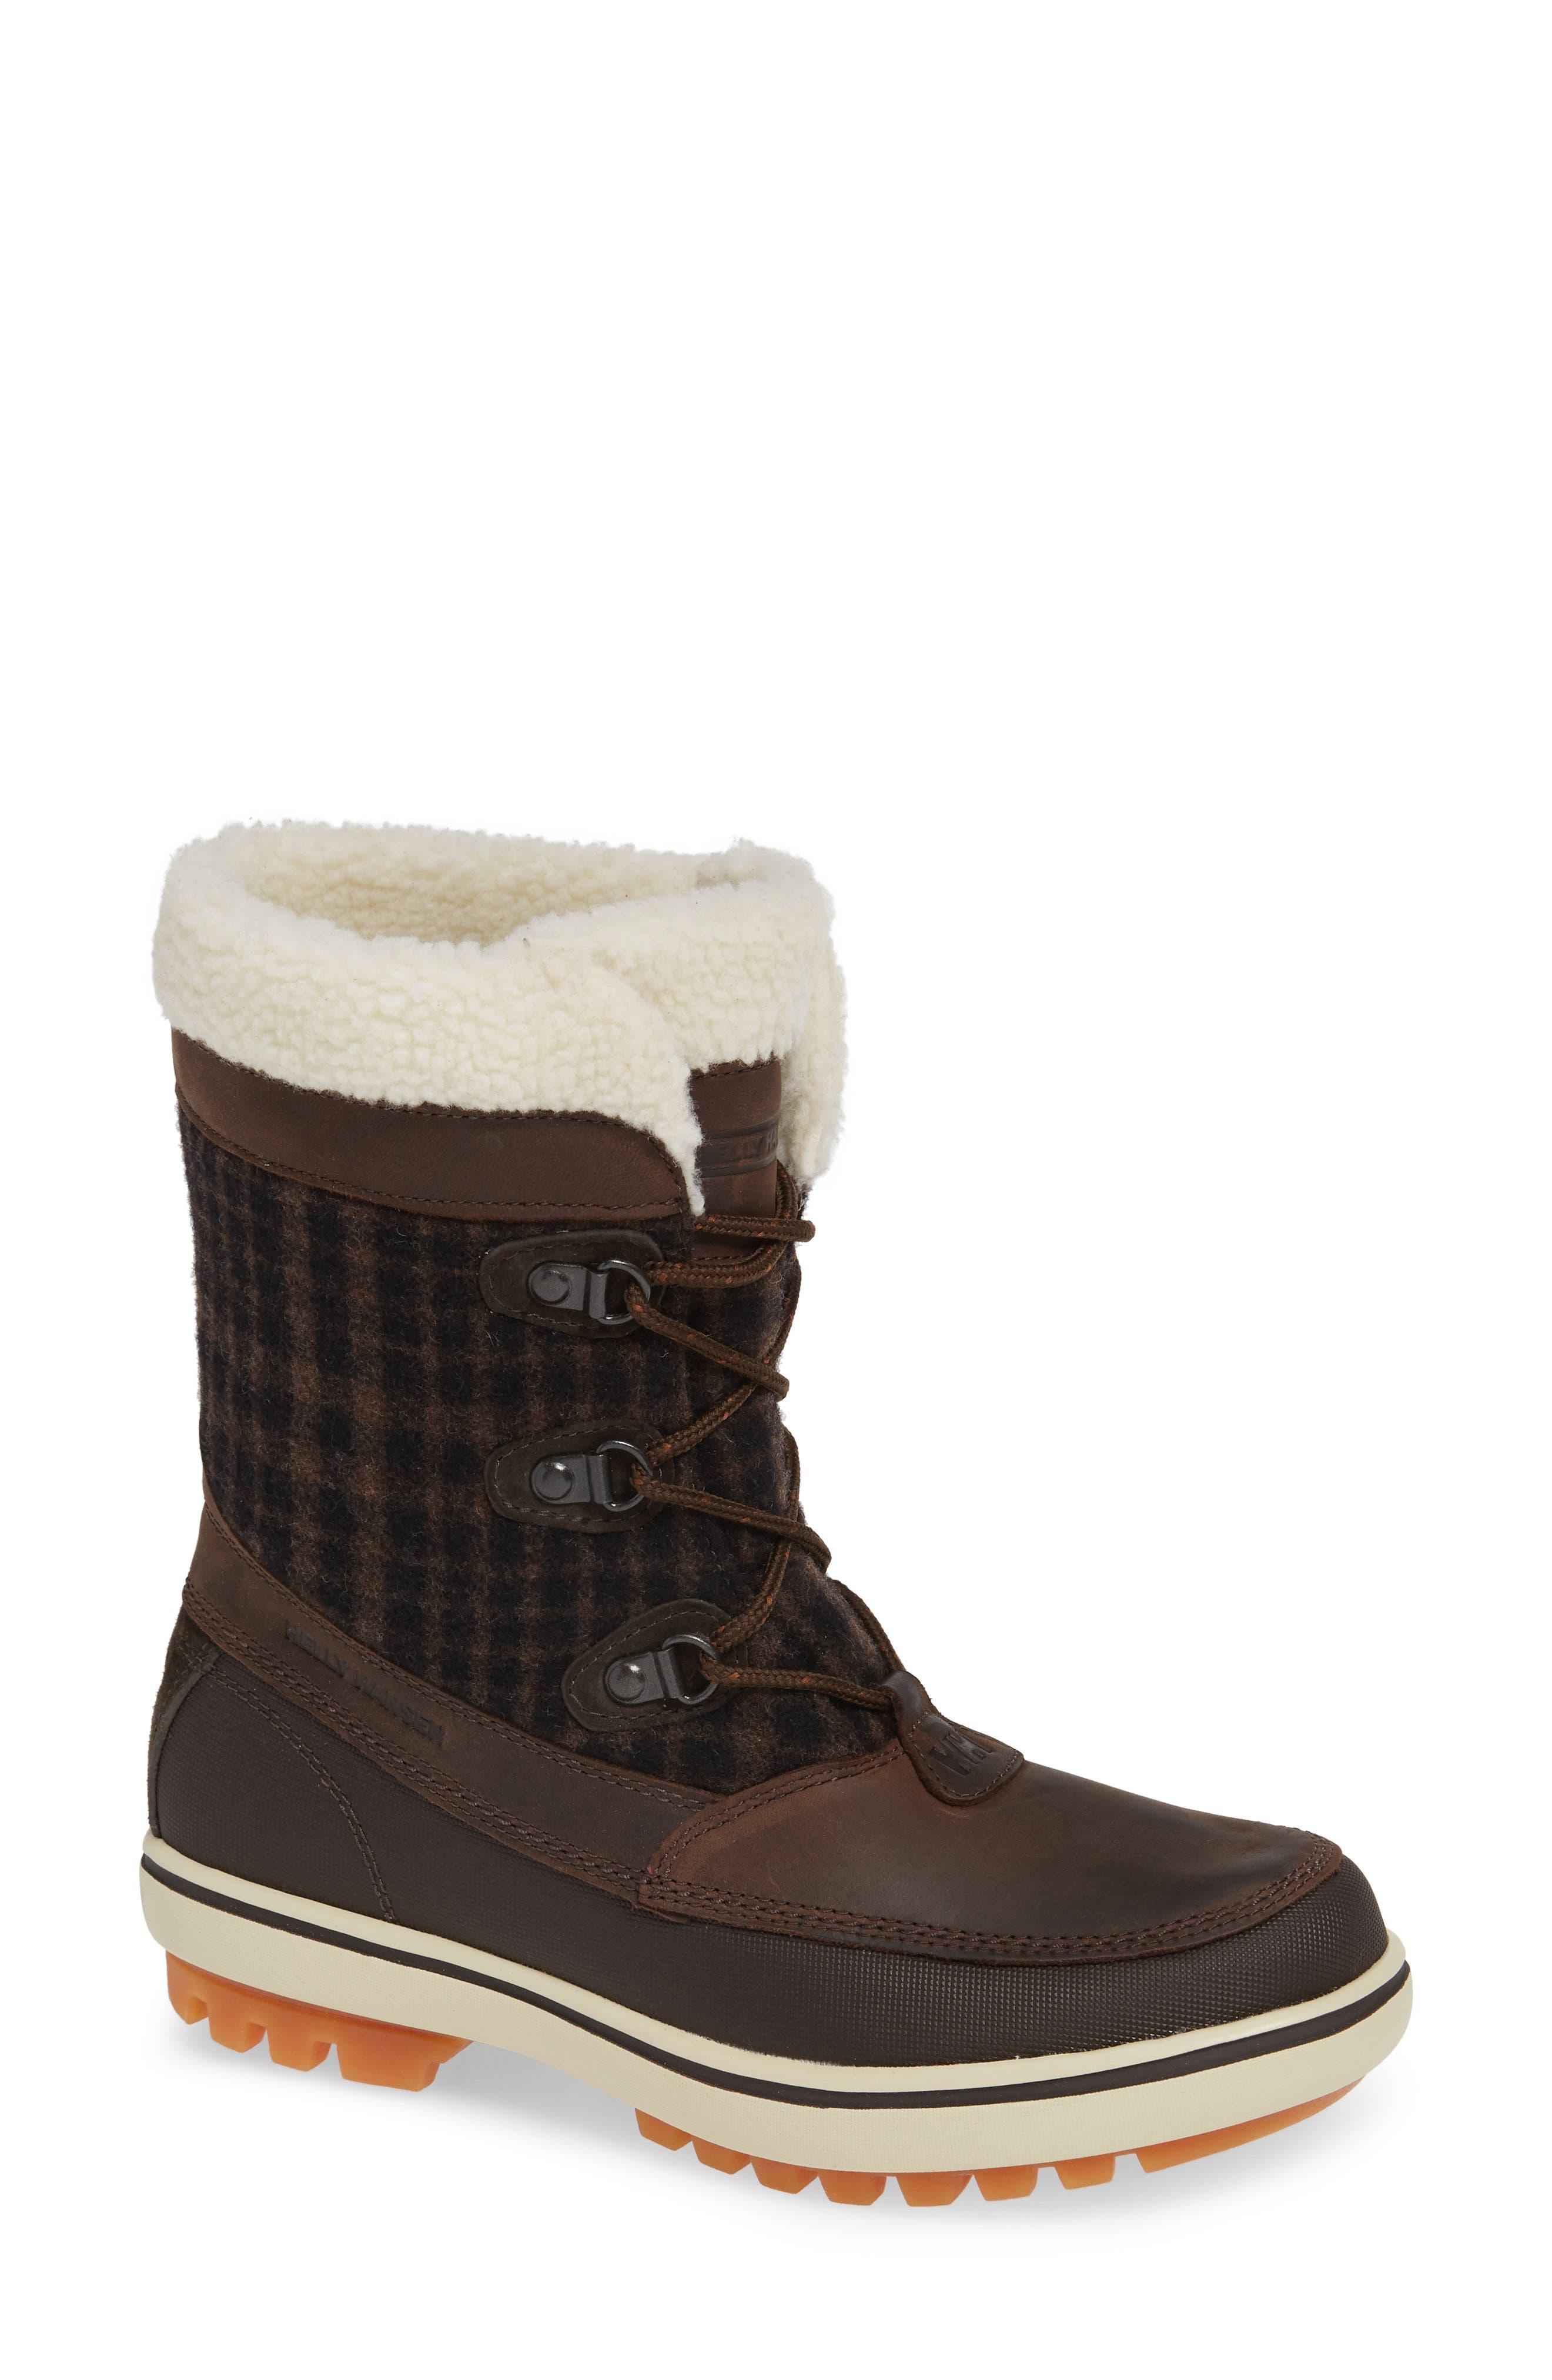 Helly Hansen Georgina Snow Waterproof Boot- Brown